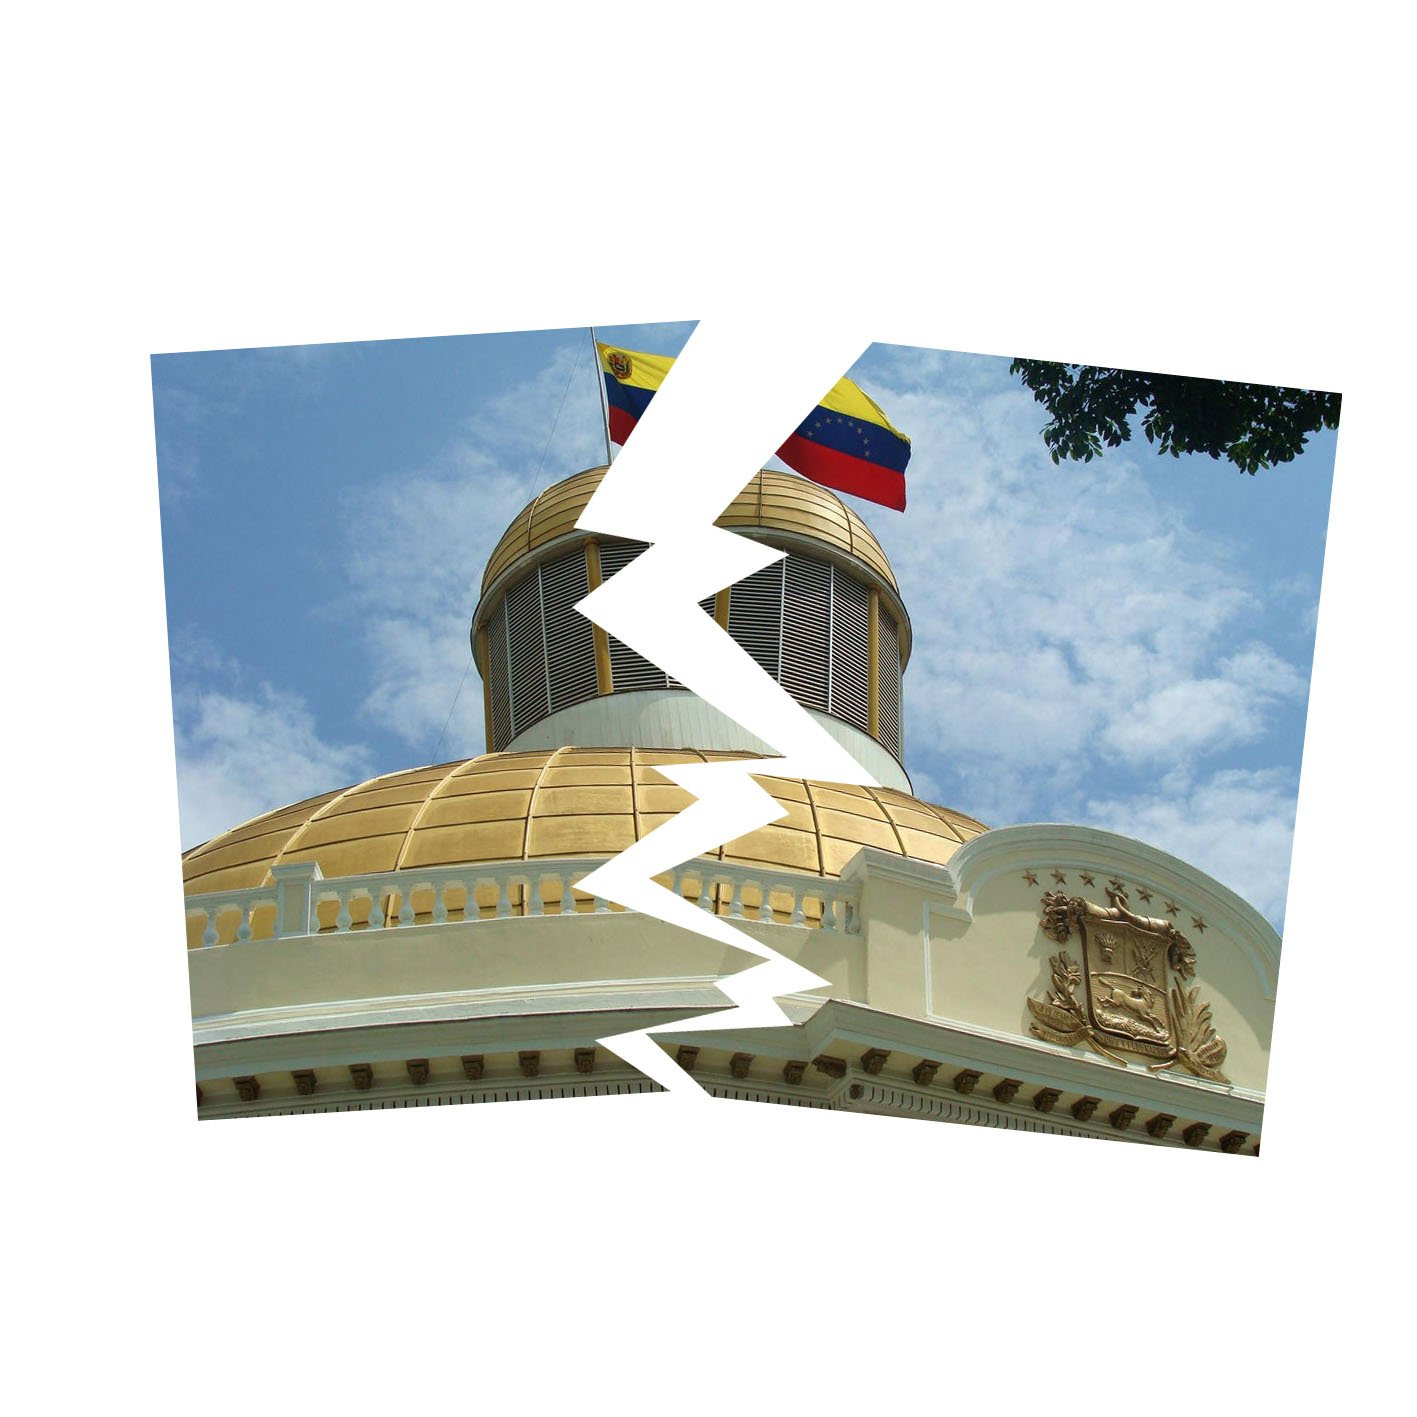 La Sala Constitucional usurpa otra vez las atribuciones de la Asamblea Nacional